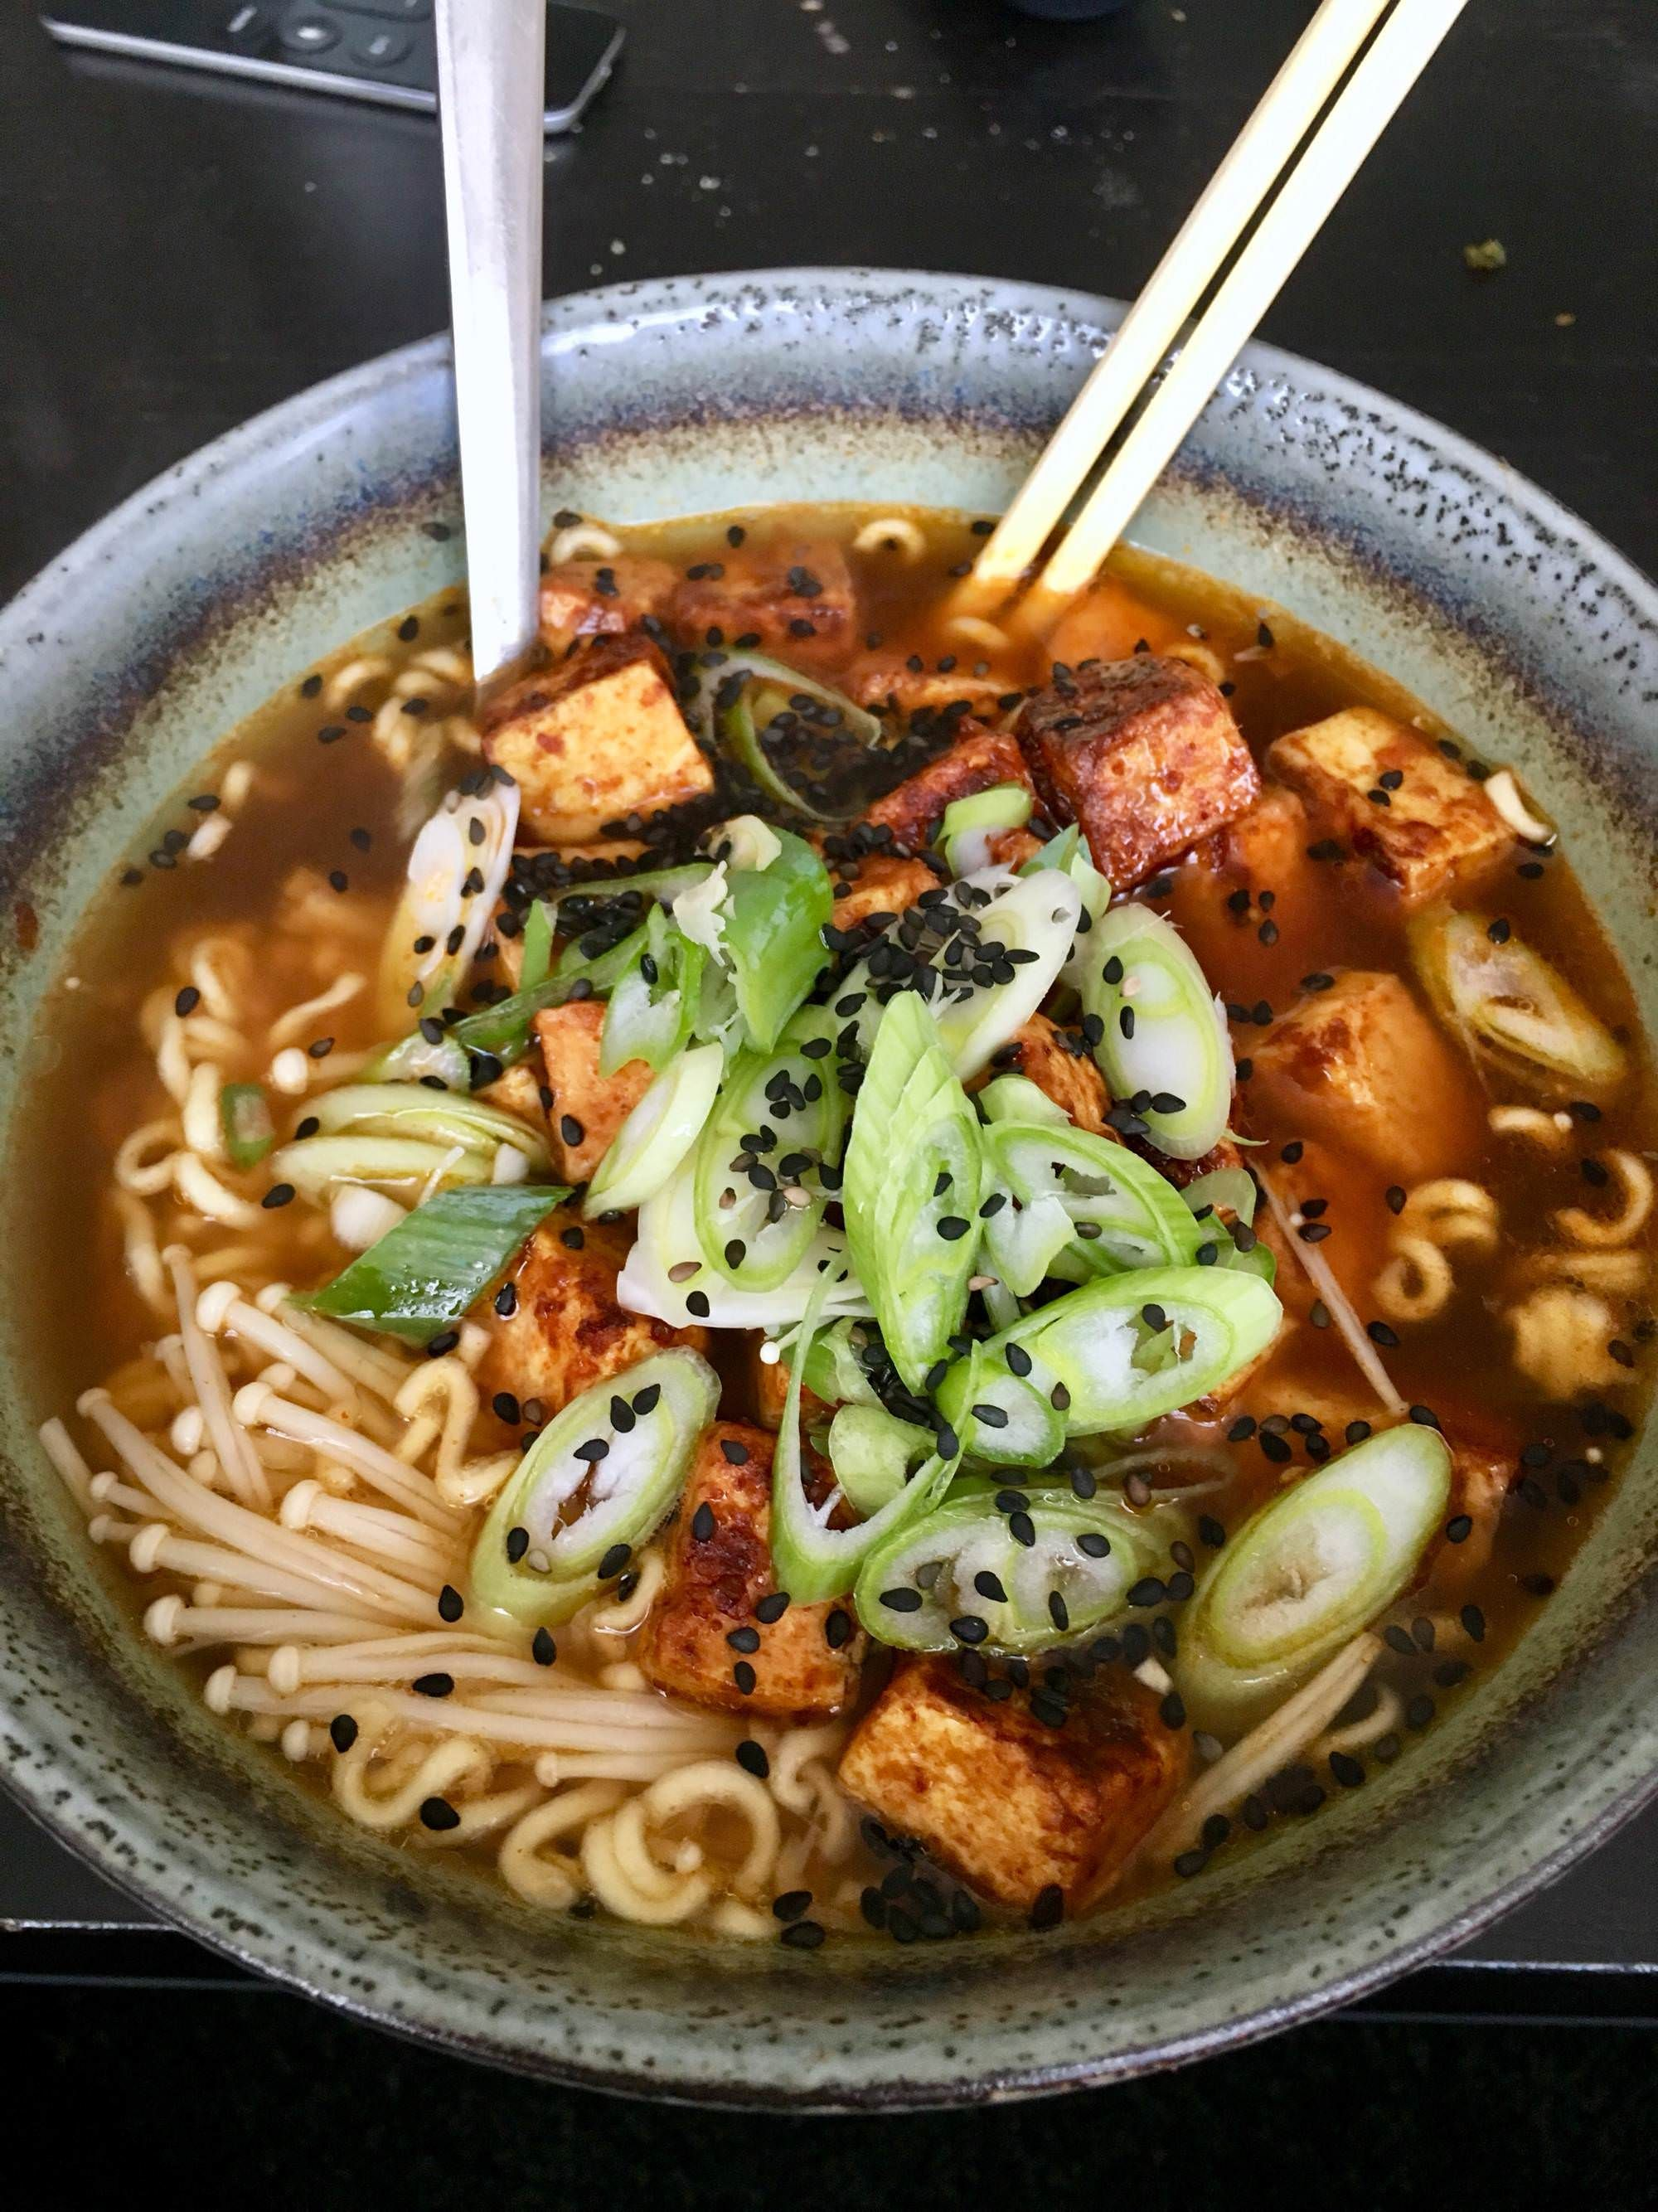 Vegan Ramen With Marinated Tofu And Enoki Mushroom Healthy Food Facts Marinated Tofu Healthy Dinner Recipes Easy